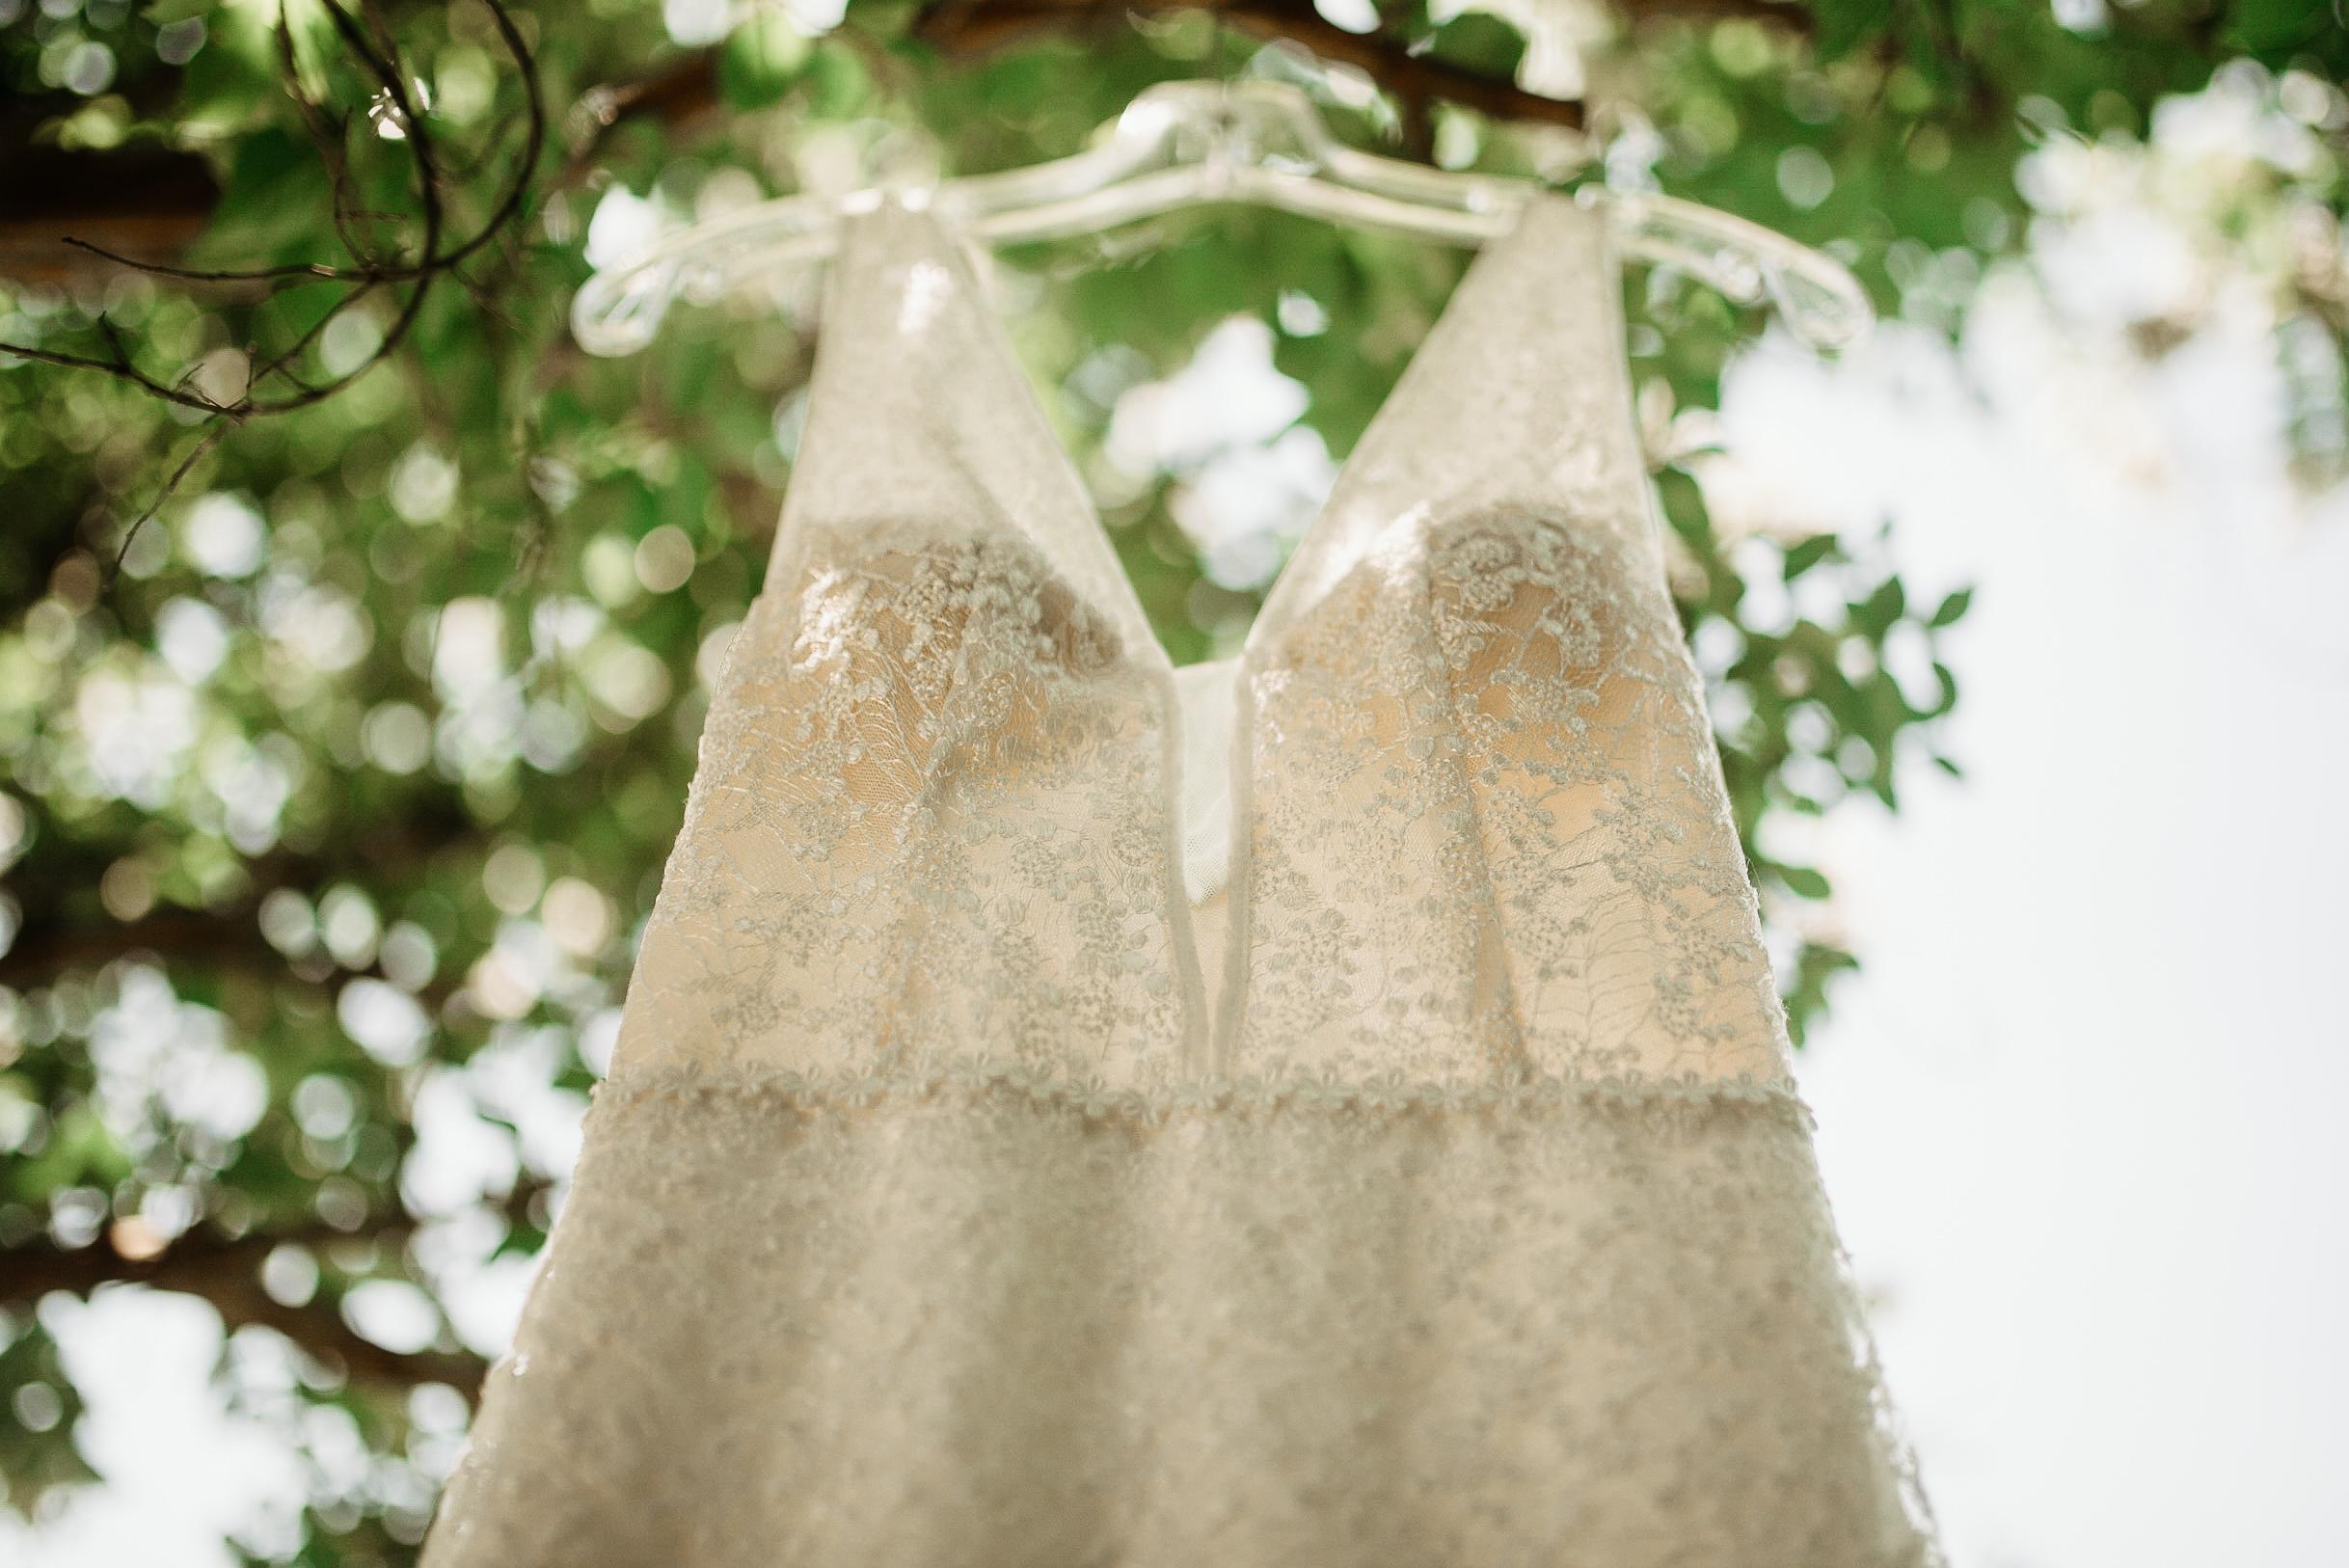 okc-wedding-photographer-coles-garden-wedding-okc-best-wedding-photographers-7.jpg